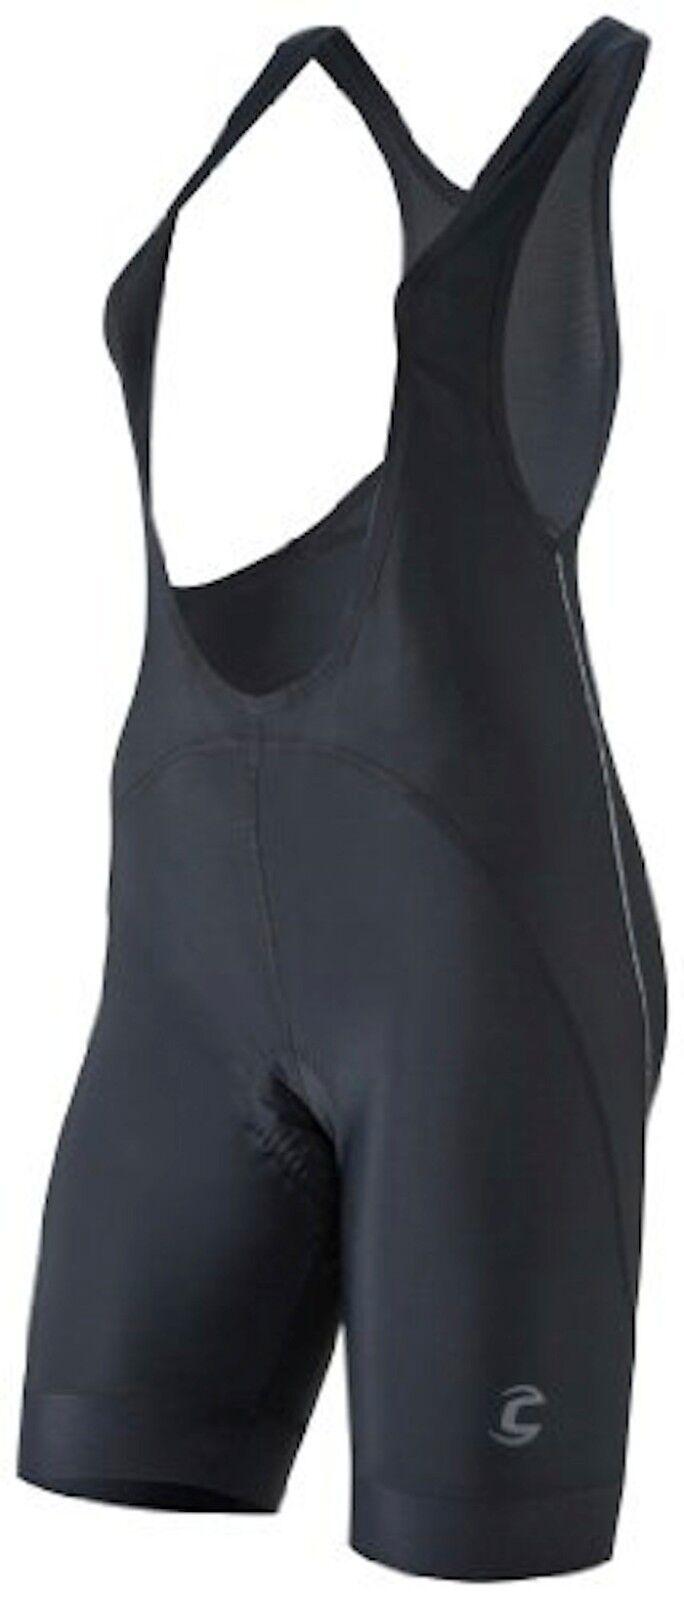 Cannondale Women's Prelude 8 Bib Cycling Shorts  Sz L  NWT 4F207L  hot sale online